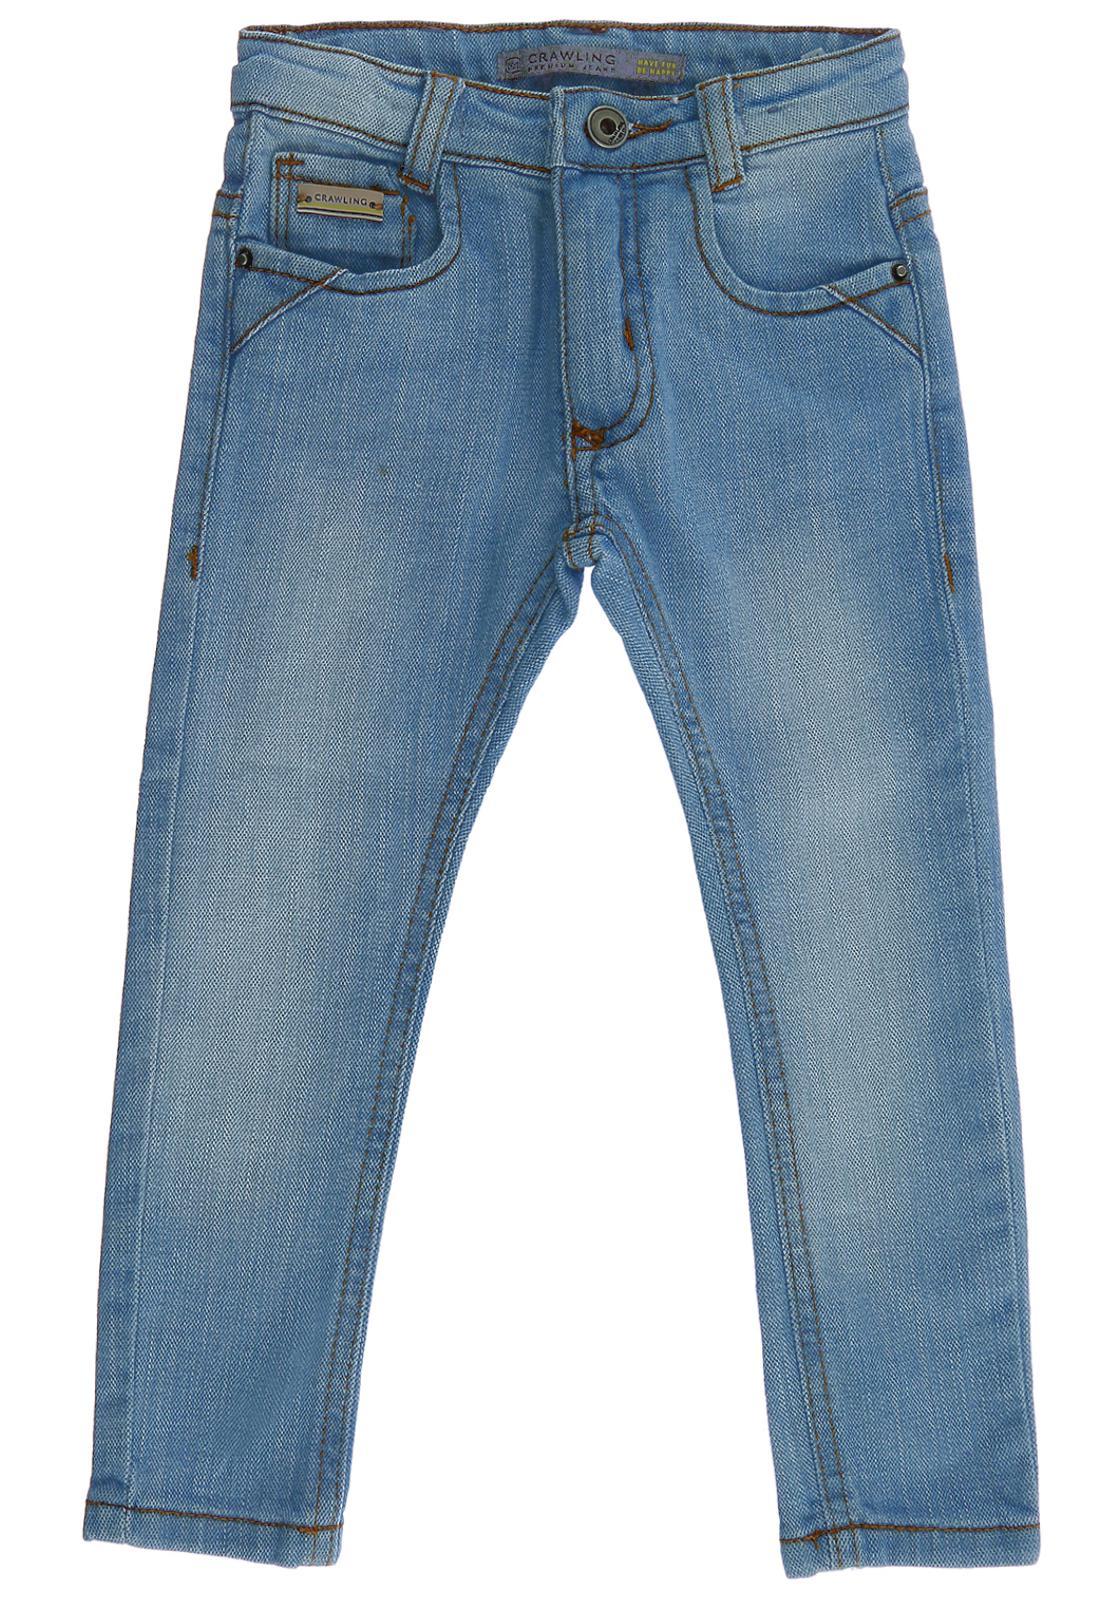 Calça Jeans Infantil Bebê Crawling